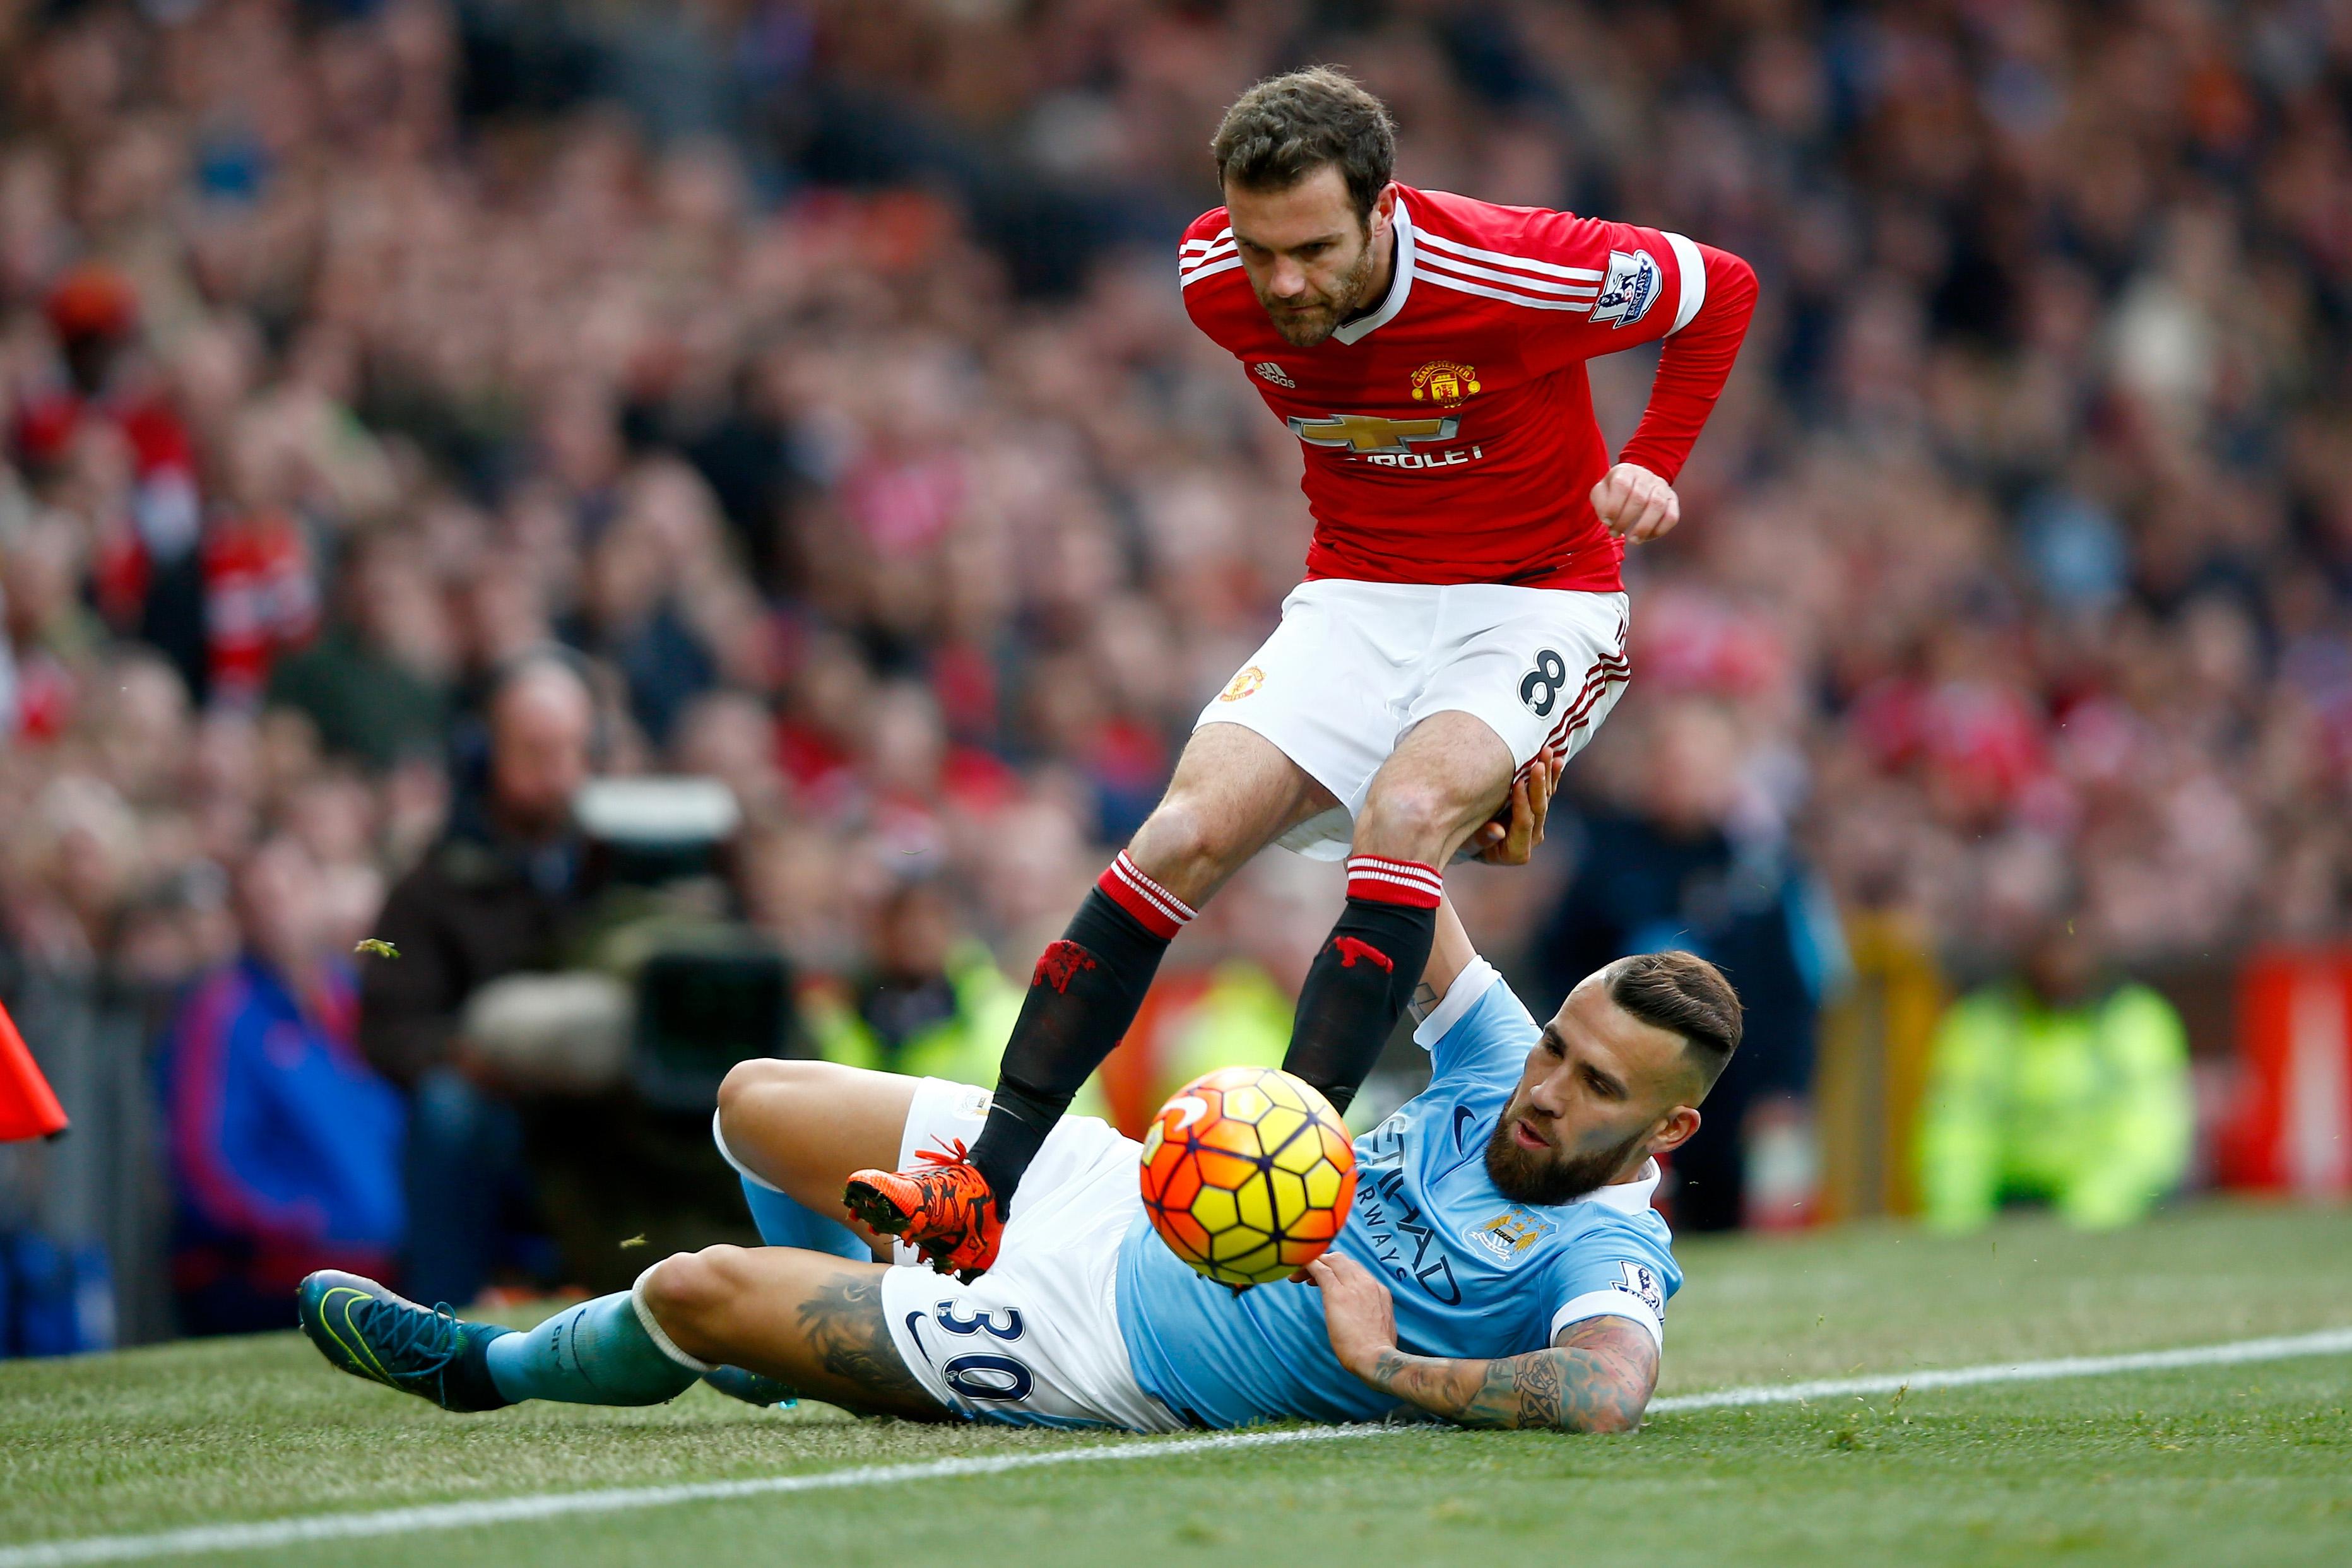 Manchester United Vs Manchester City: Manchester City Vs. Manchester United: Predicted XI